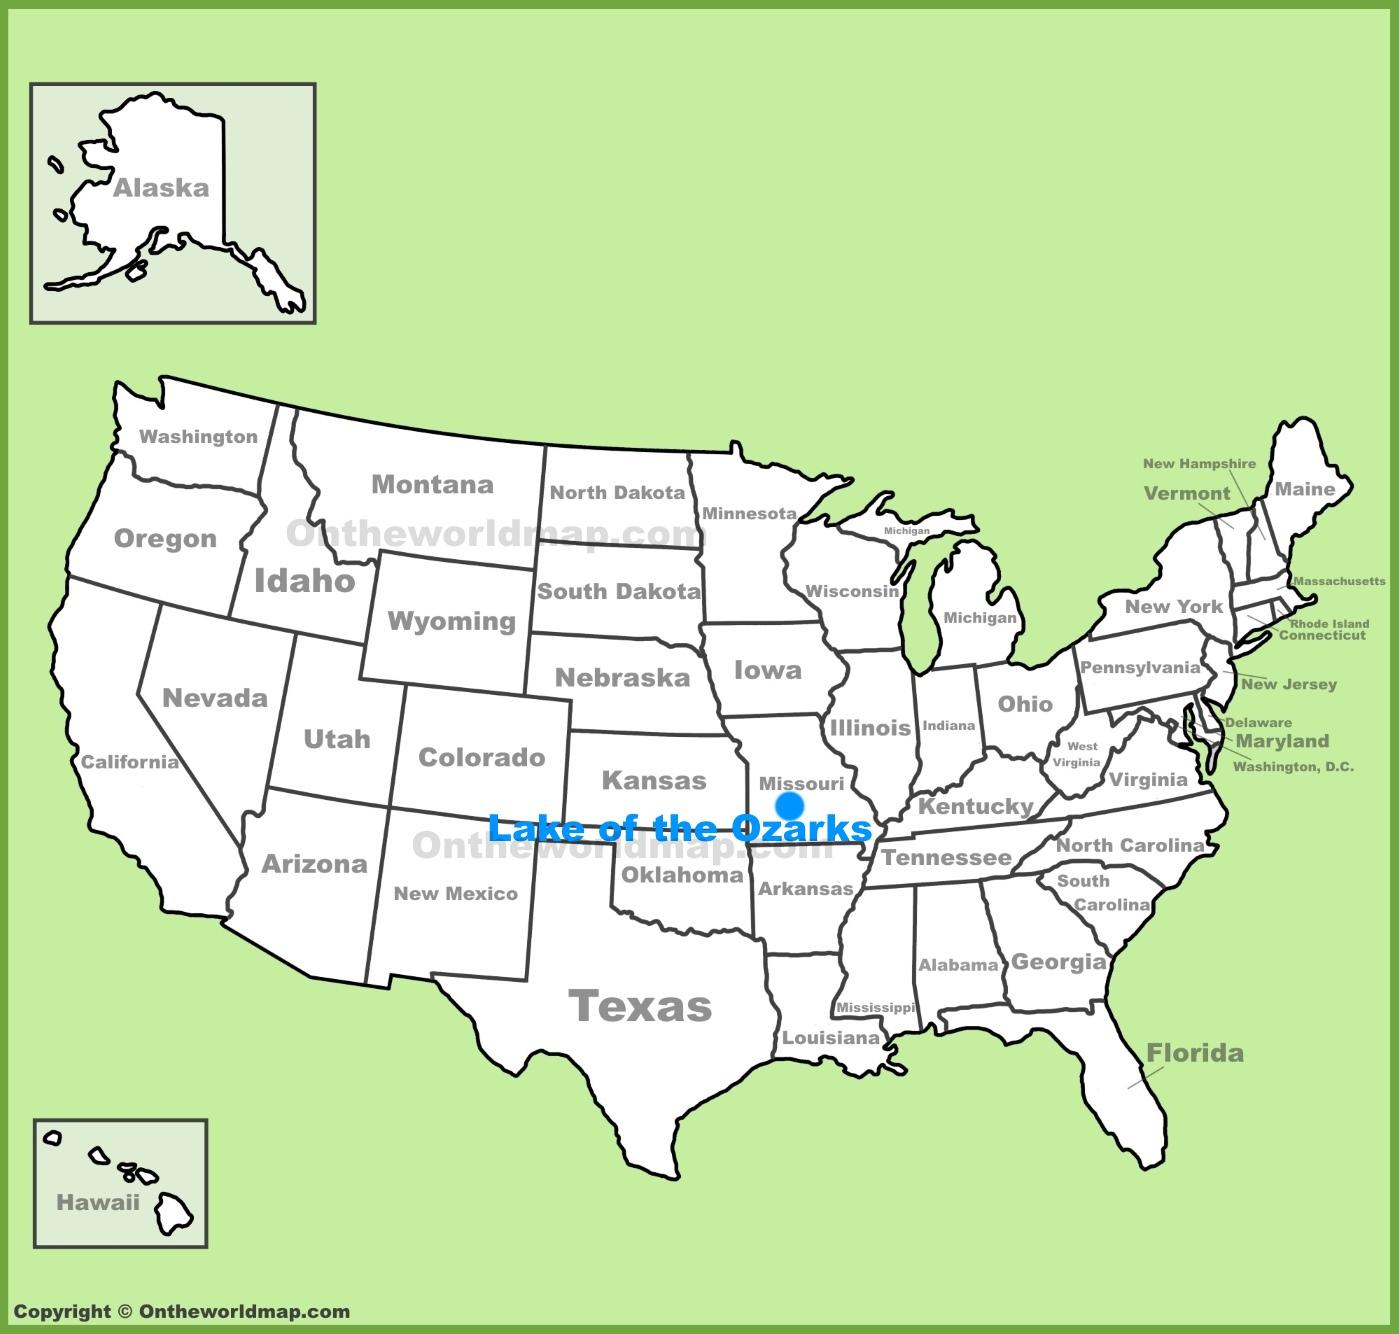 Lake Of The Ozarks Map Lake of the Ozarks location on the U.S. Map Lake Of The Ozarks Map